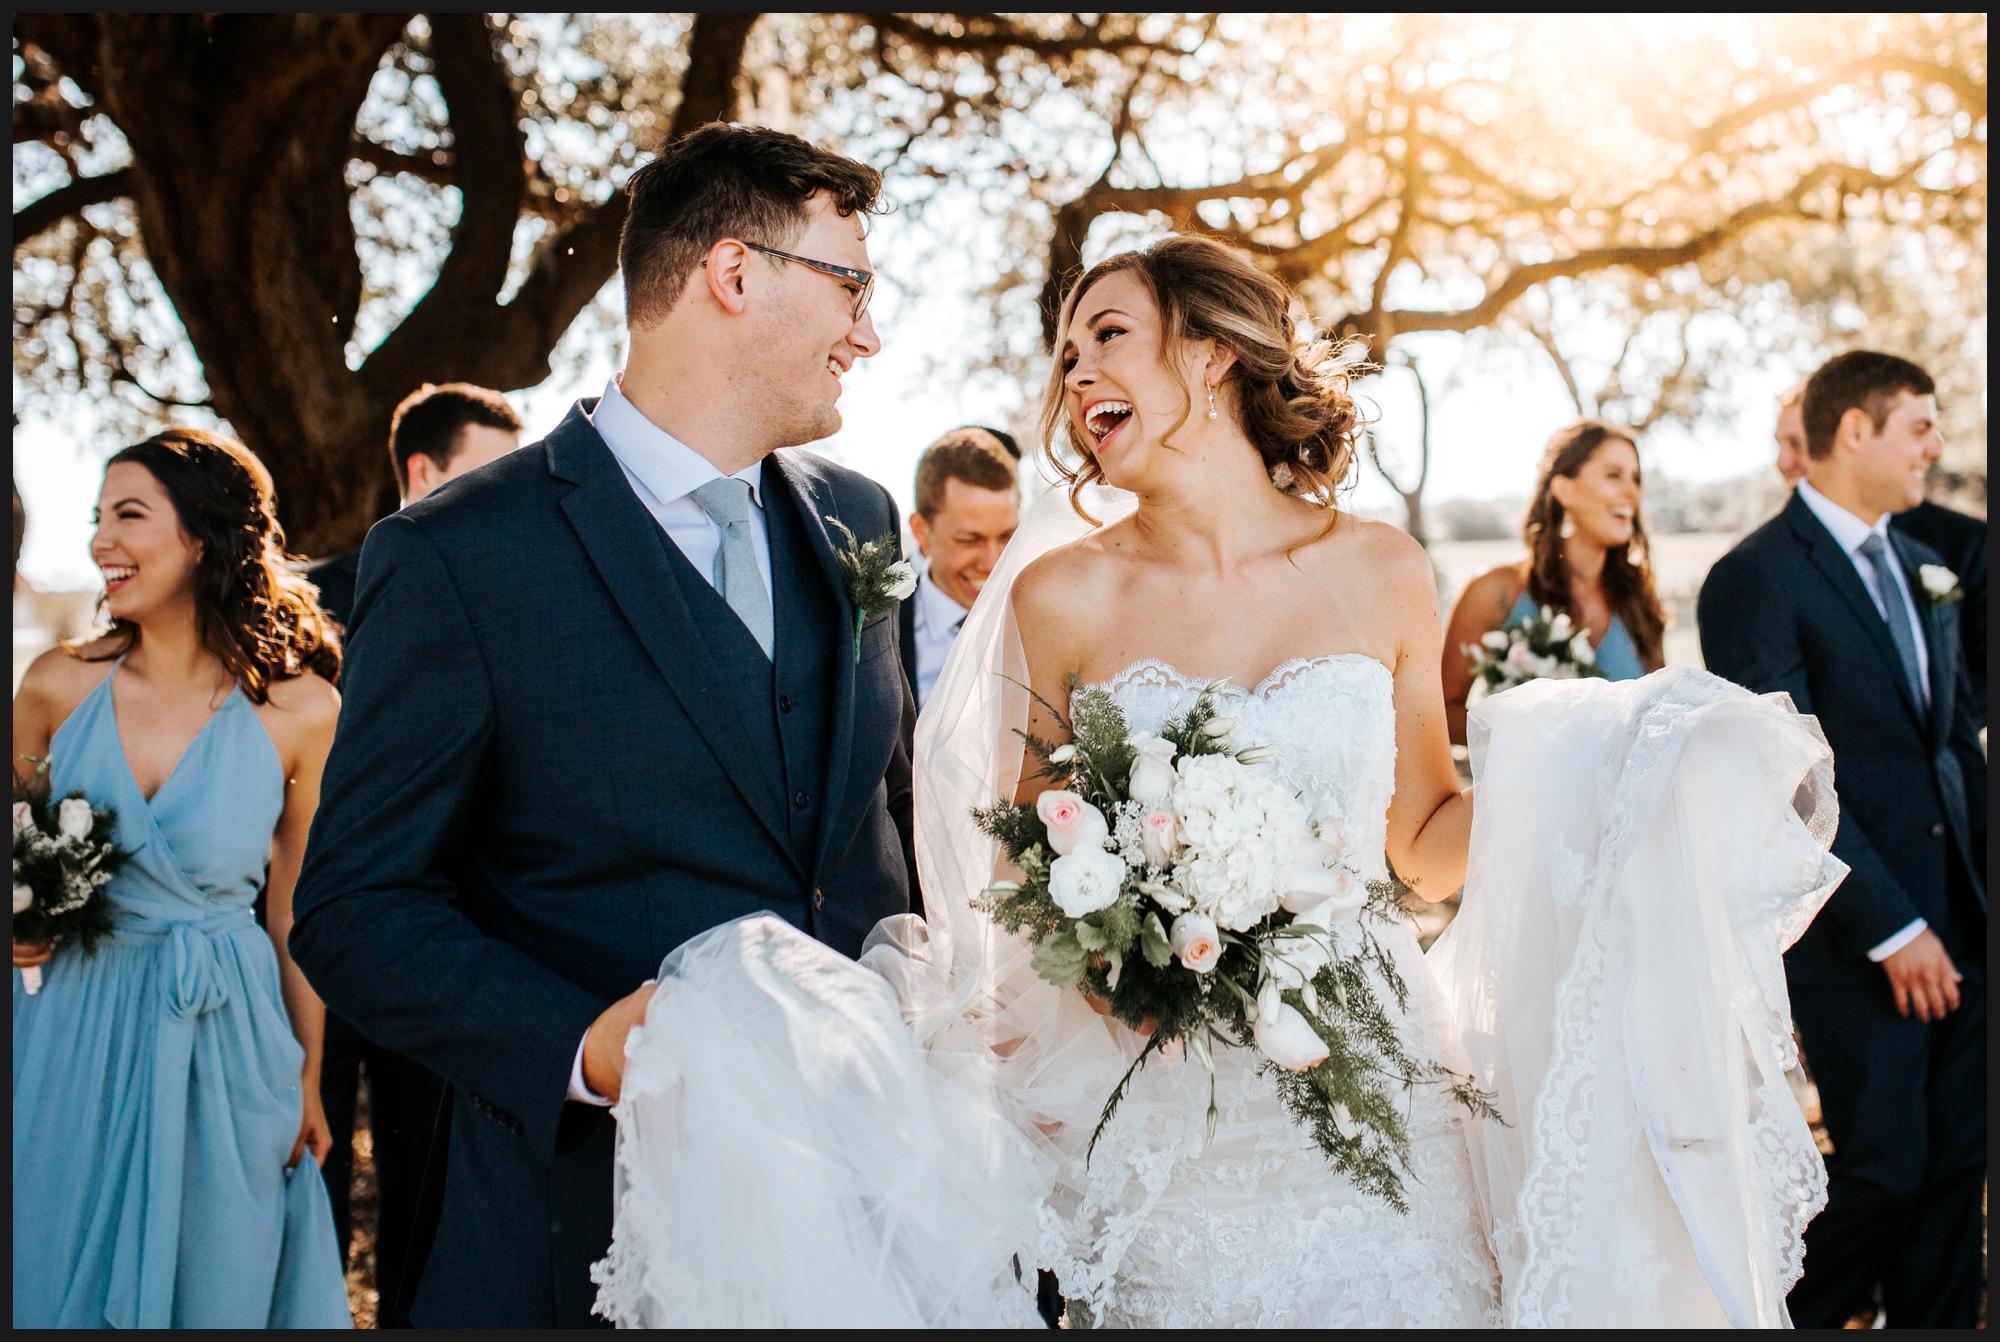 Orlando-Wedding-Photographer-destination-wedding-photographer-florida-wedding-photographer-bohemian-wedding-photographer_0079.jpg